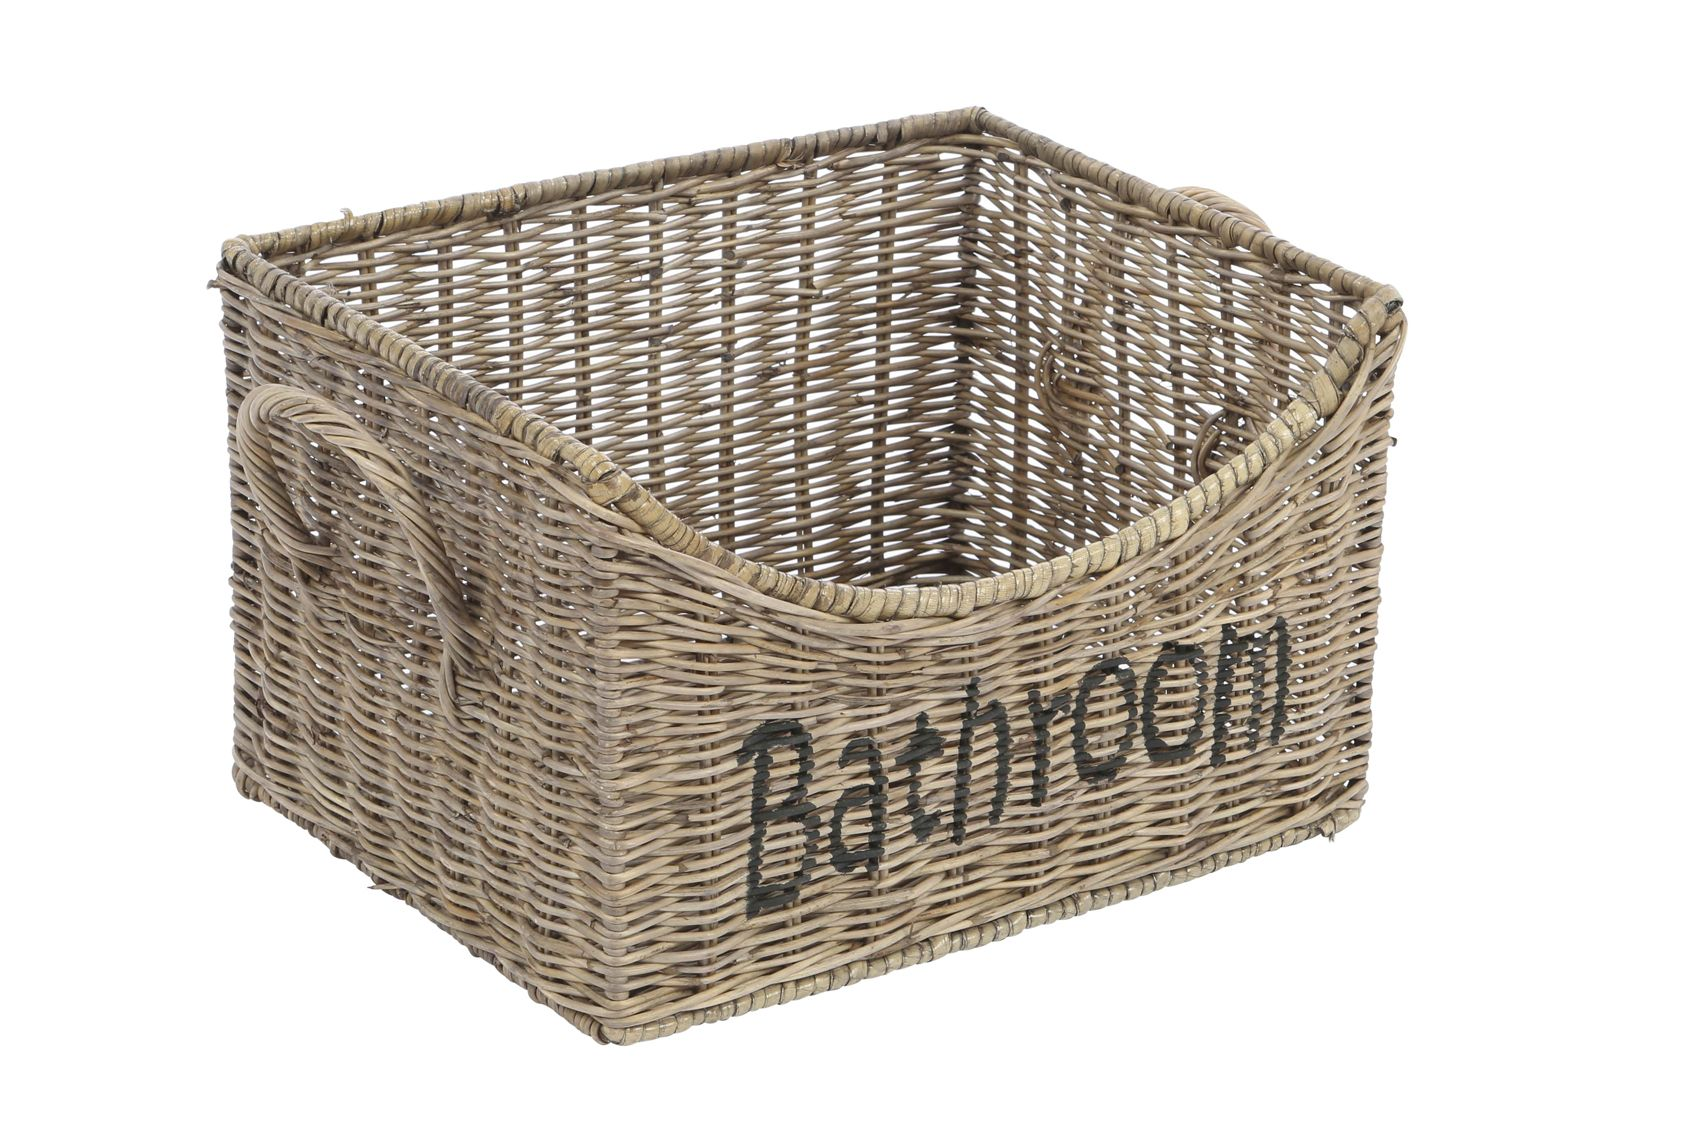 Rattan Badezimmerkorb